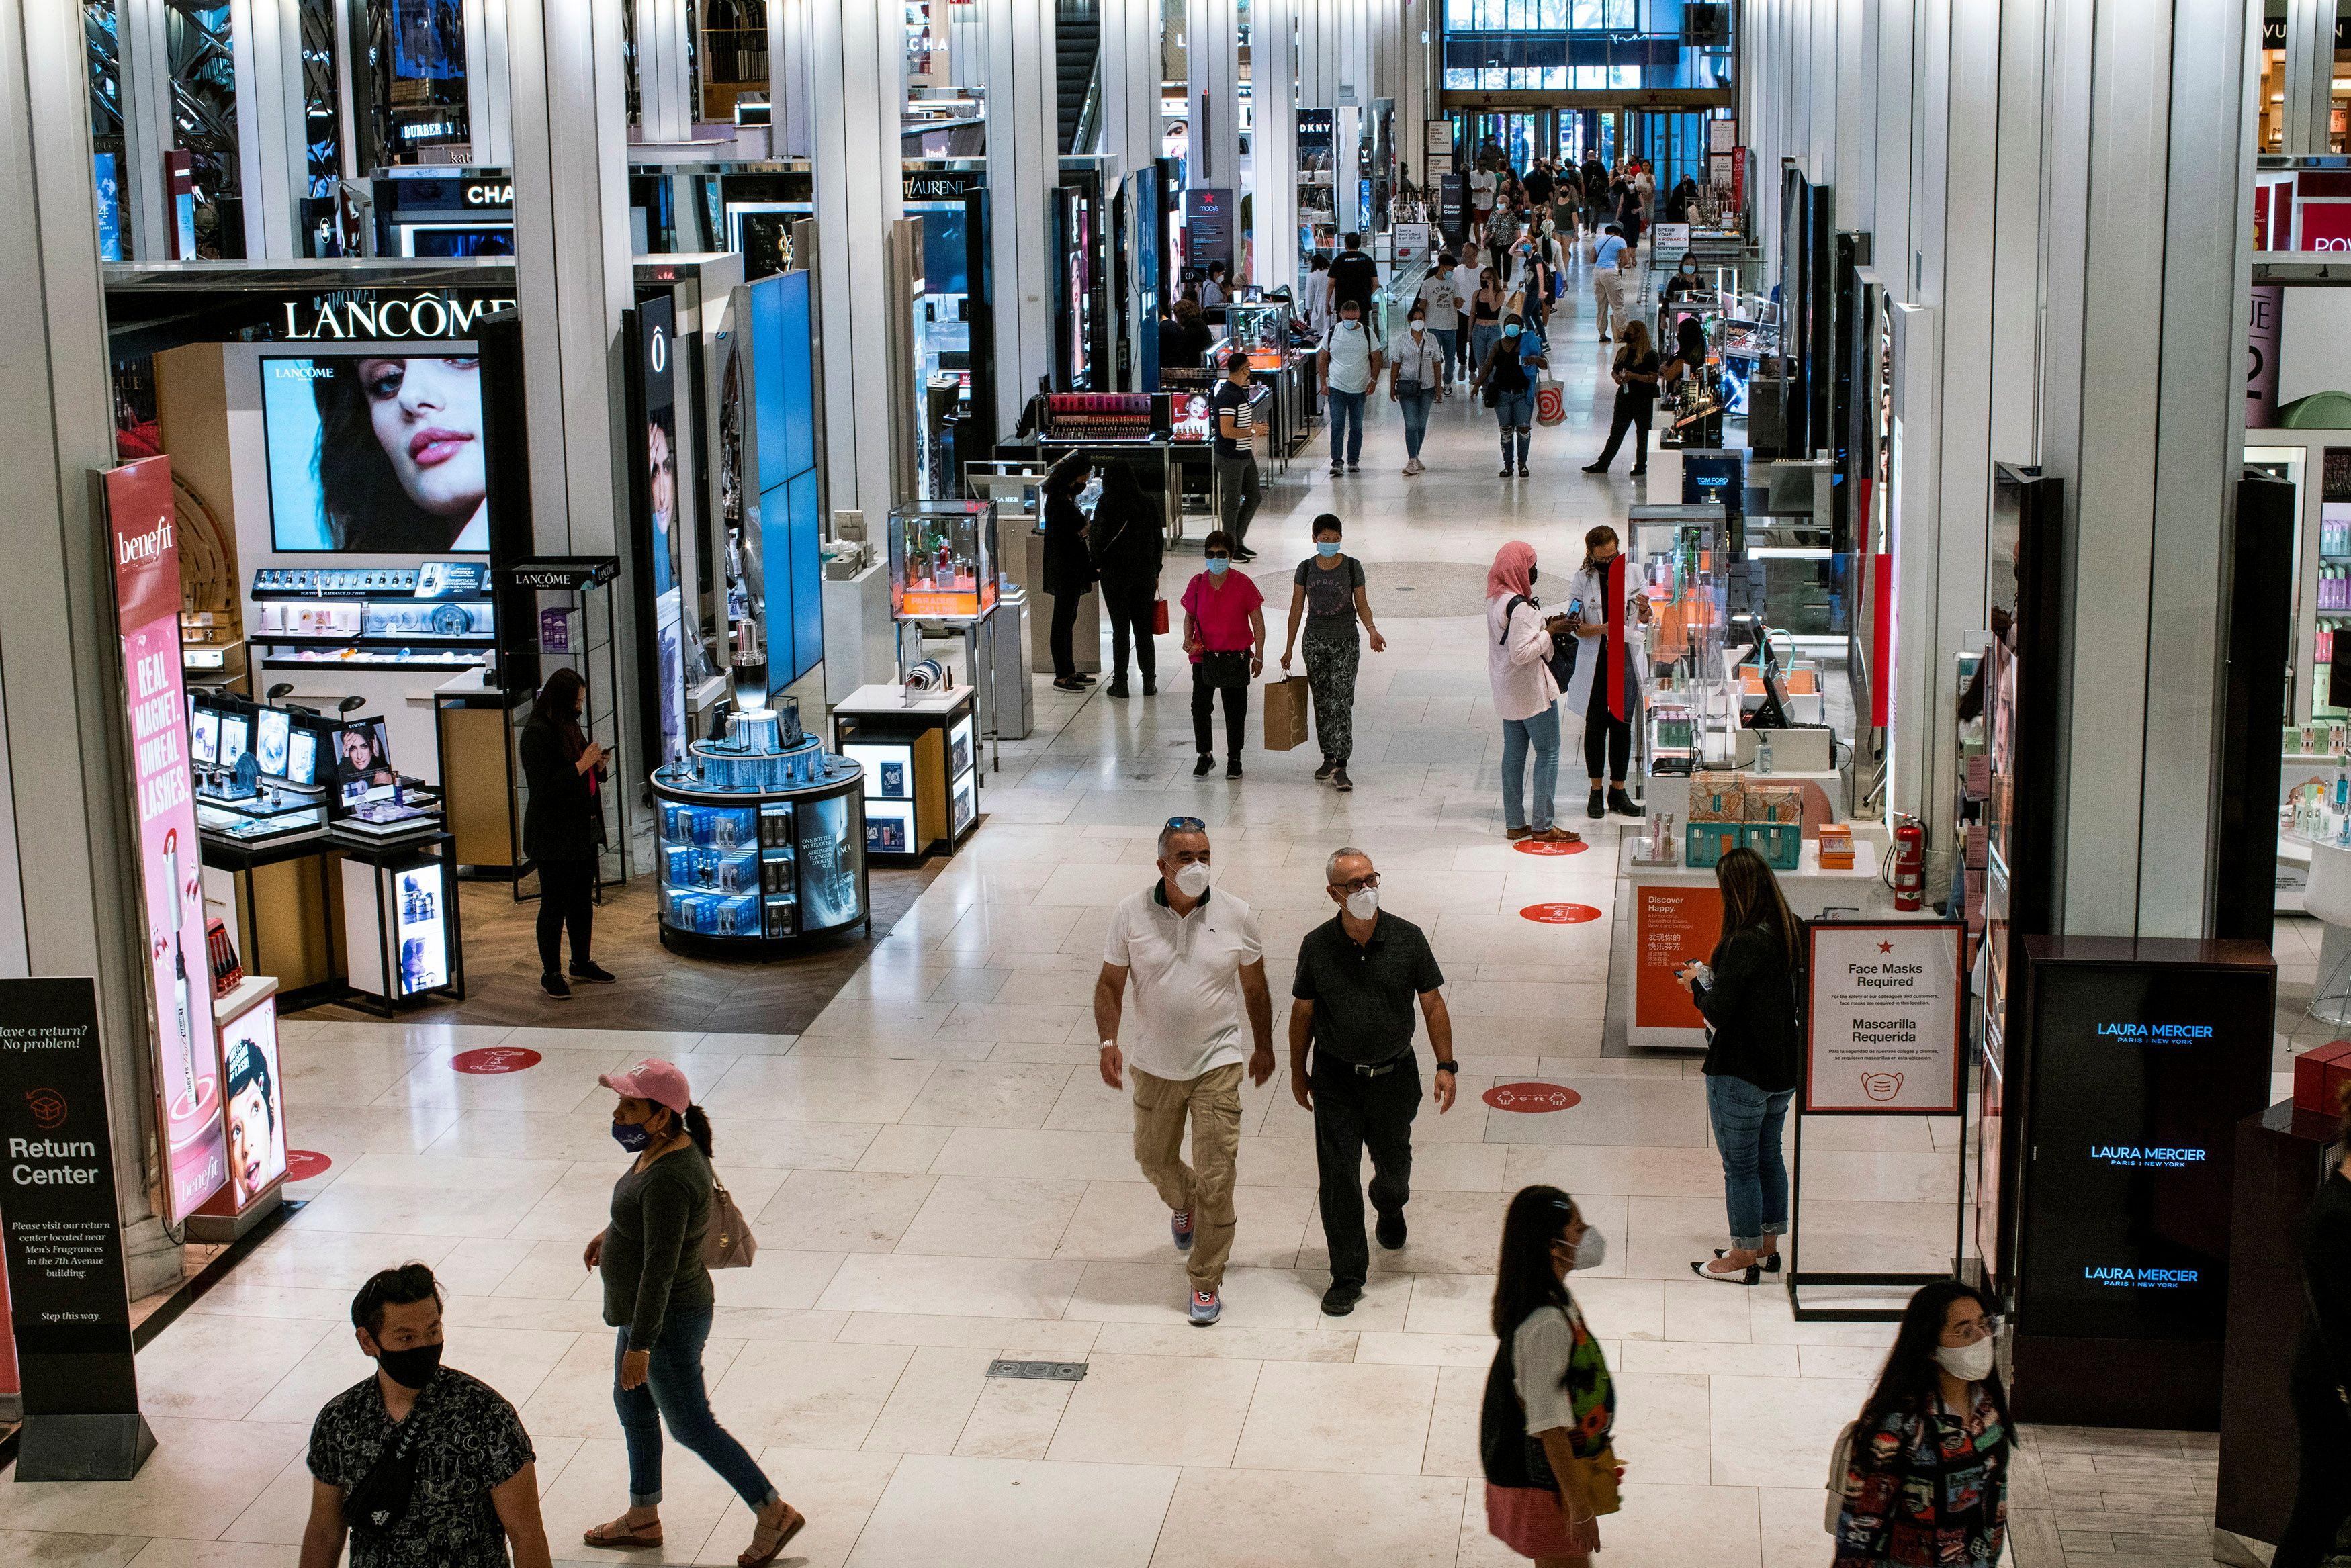 Customers visit Macy's flagship store in New York City, New York, U.S., May 20, 2021.  REUTERS/Eduardo Munoz